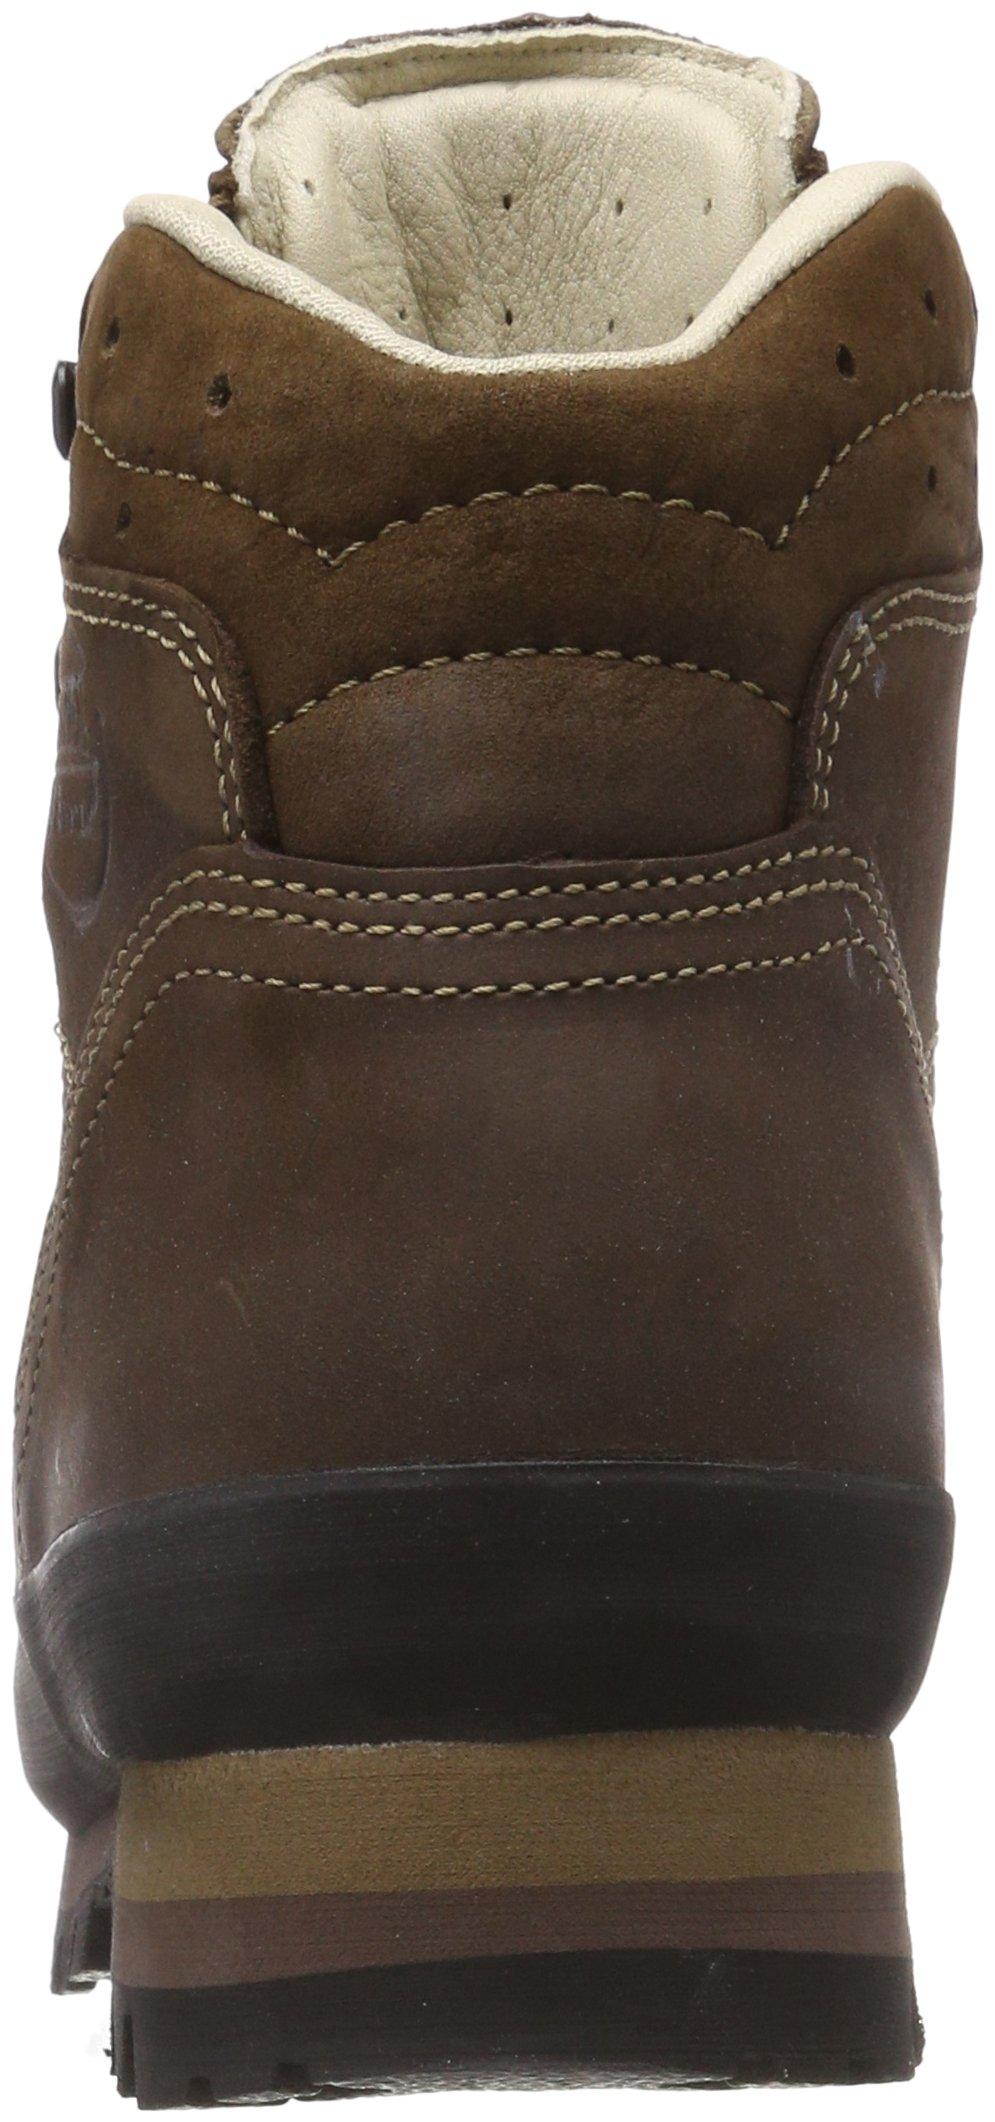 7113BEEUkmL - Meindl Women's Borneo Lady 2 MFS (XL) High Rise Hiking Shoes